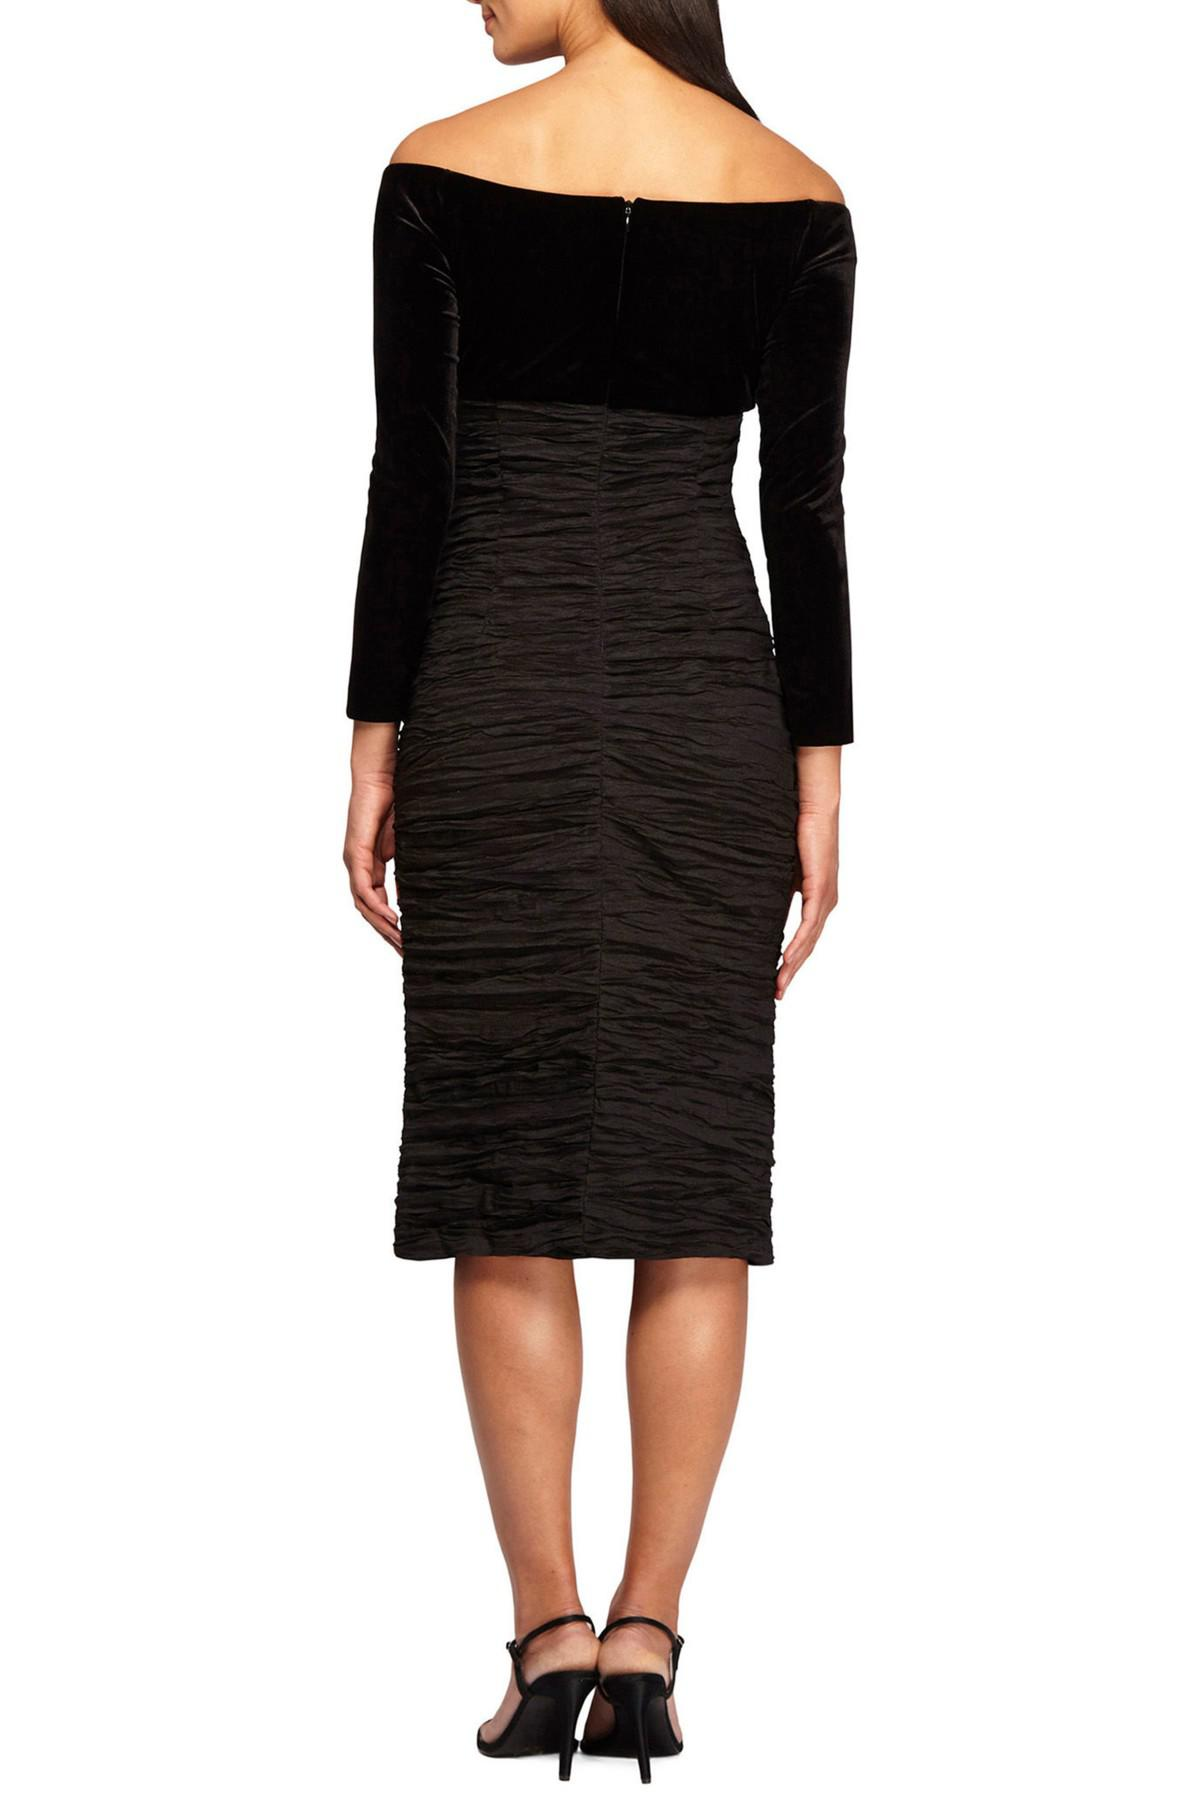 00602bca337 Lyst - Alex Evenings Off The Shoulder Velvet   Taffeta Sheath Dress ...